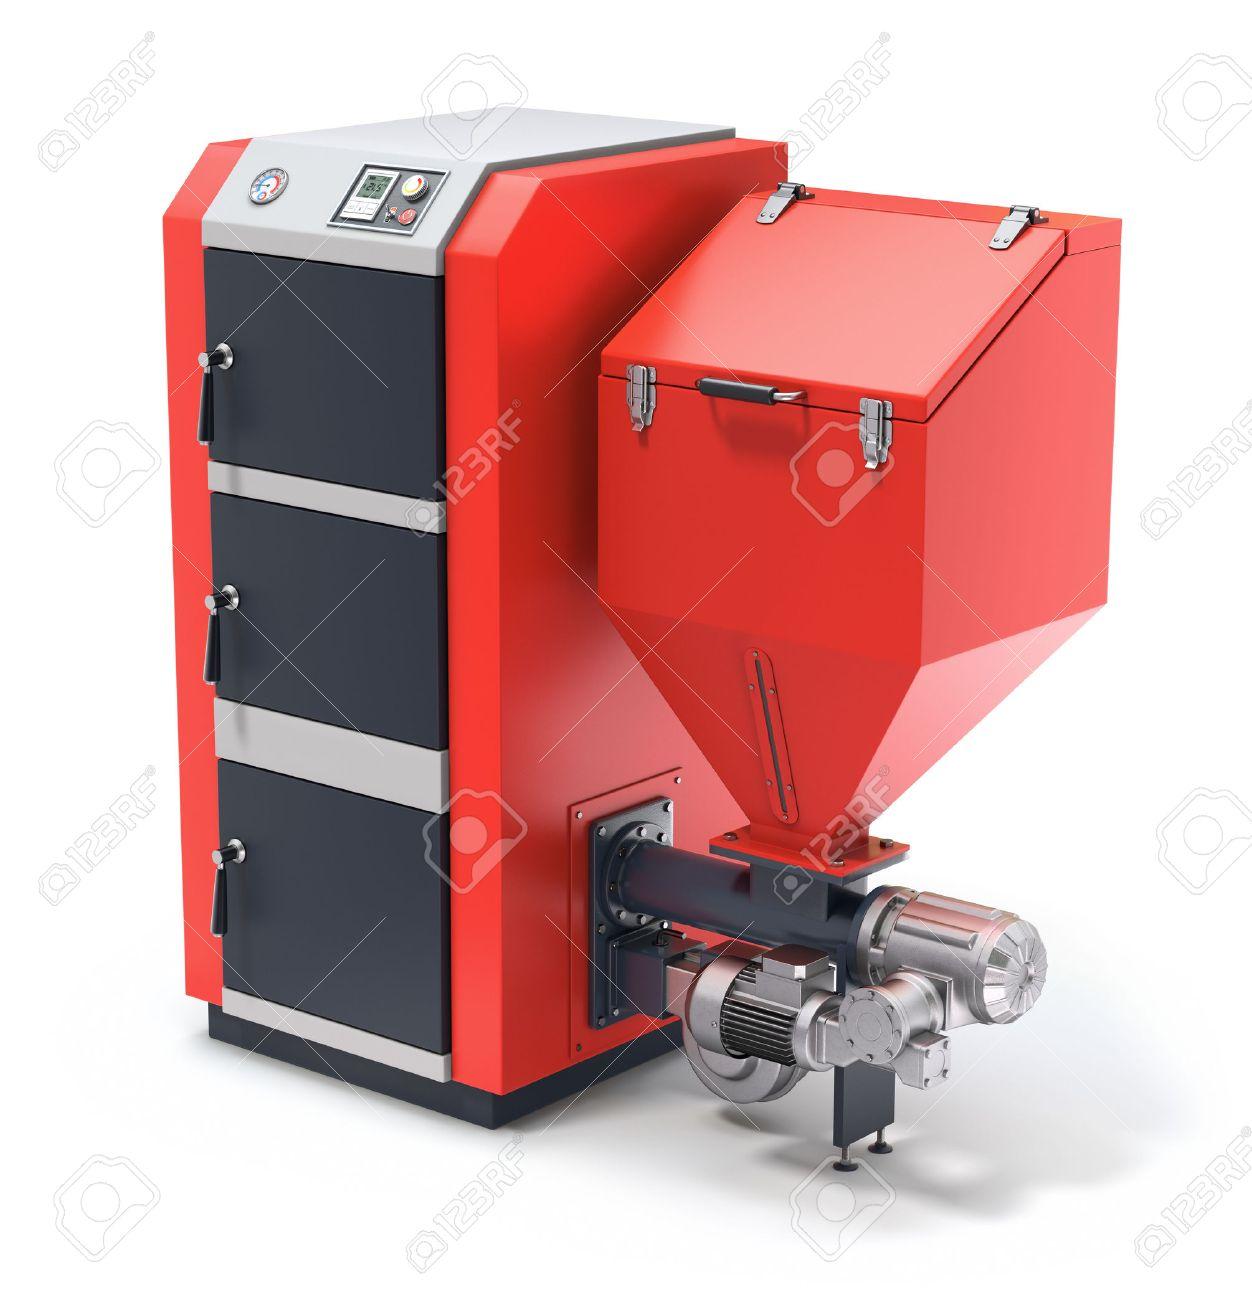 Wood Pellet Boiler >> Wood Pellet Boiler With Fuel Hooper And Feeding System